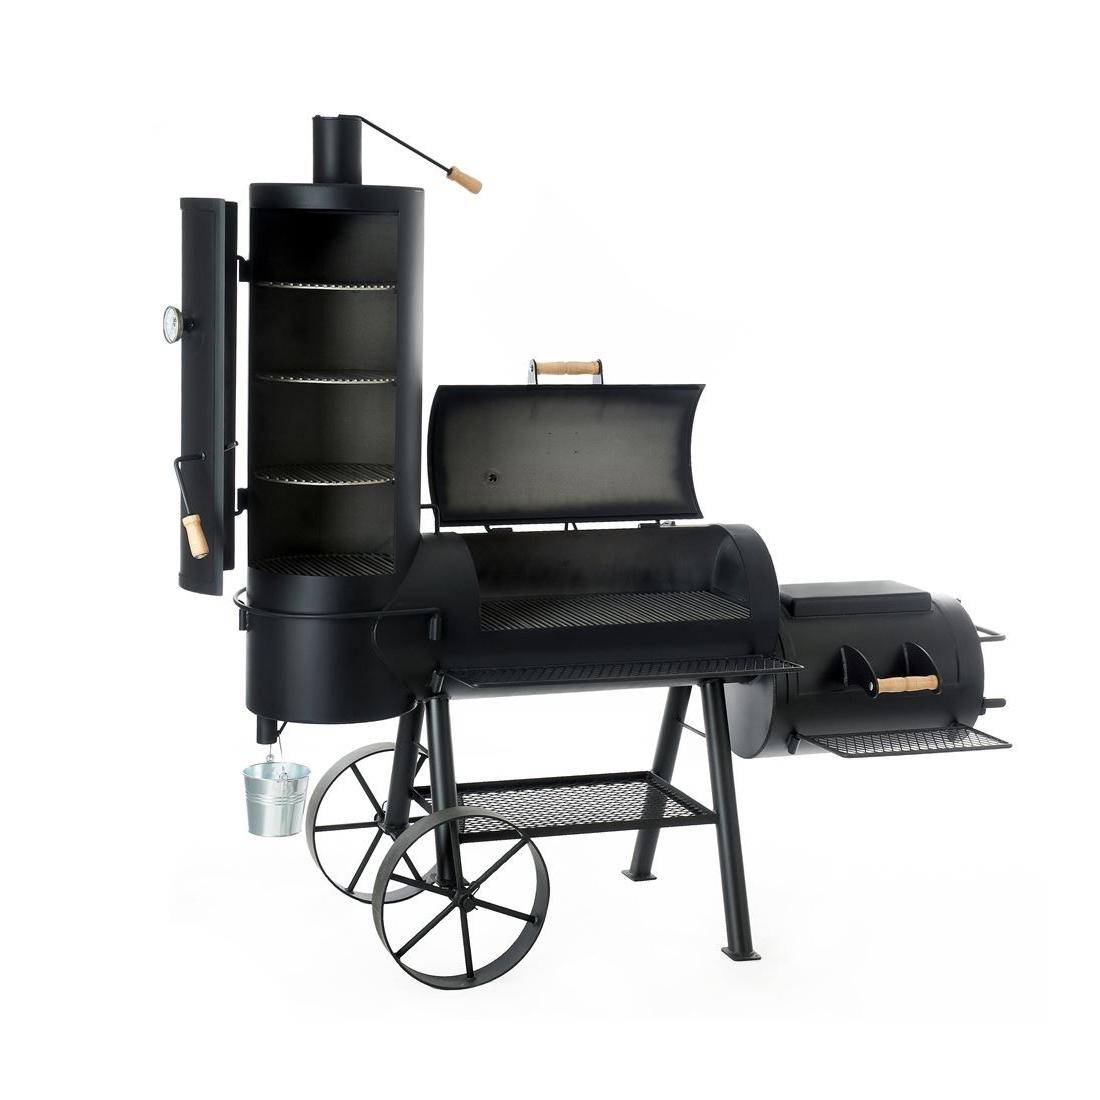 joe s bbq smoker chuckwagon 16 griller shop graz. Black Bedroom Furniture Sets. Home Design Ideas